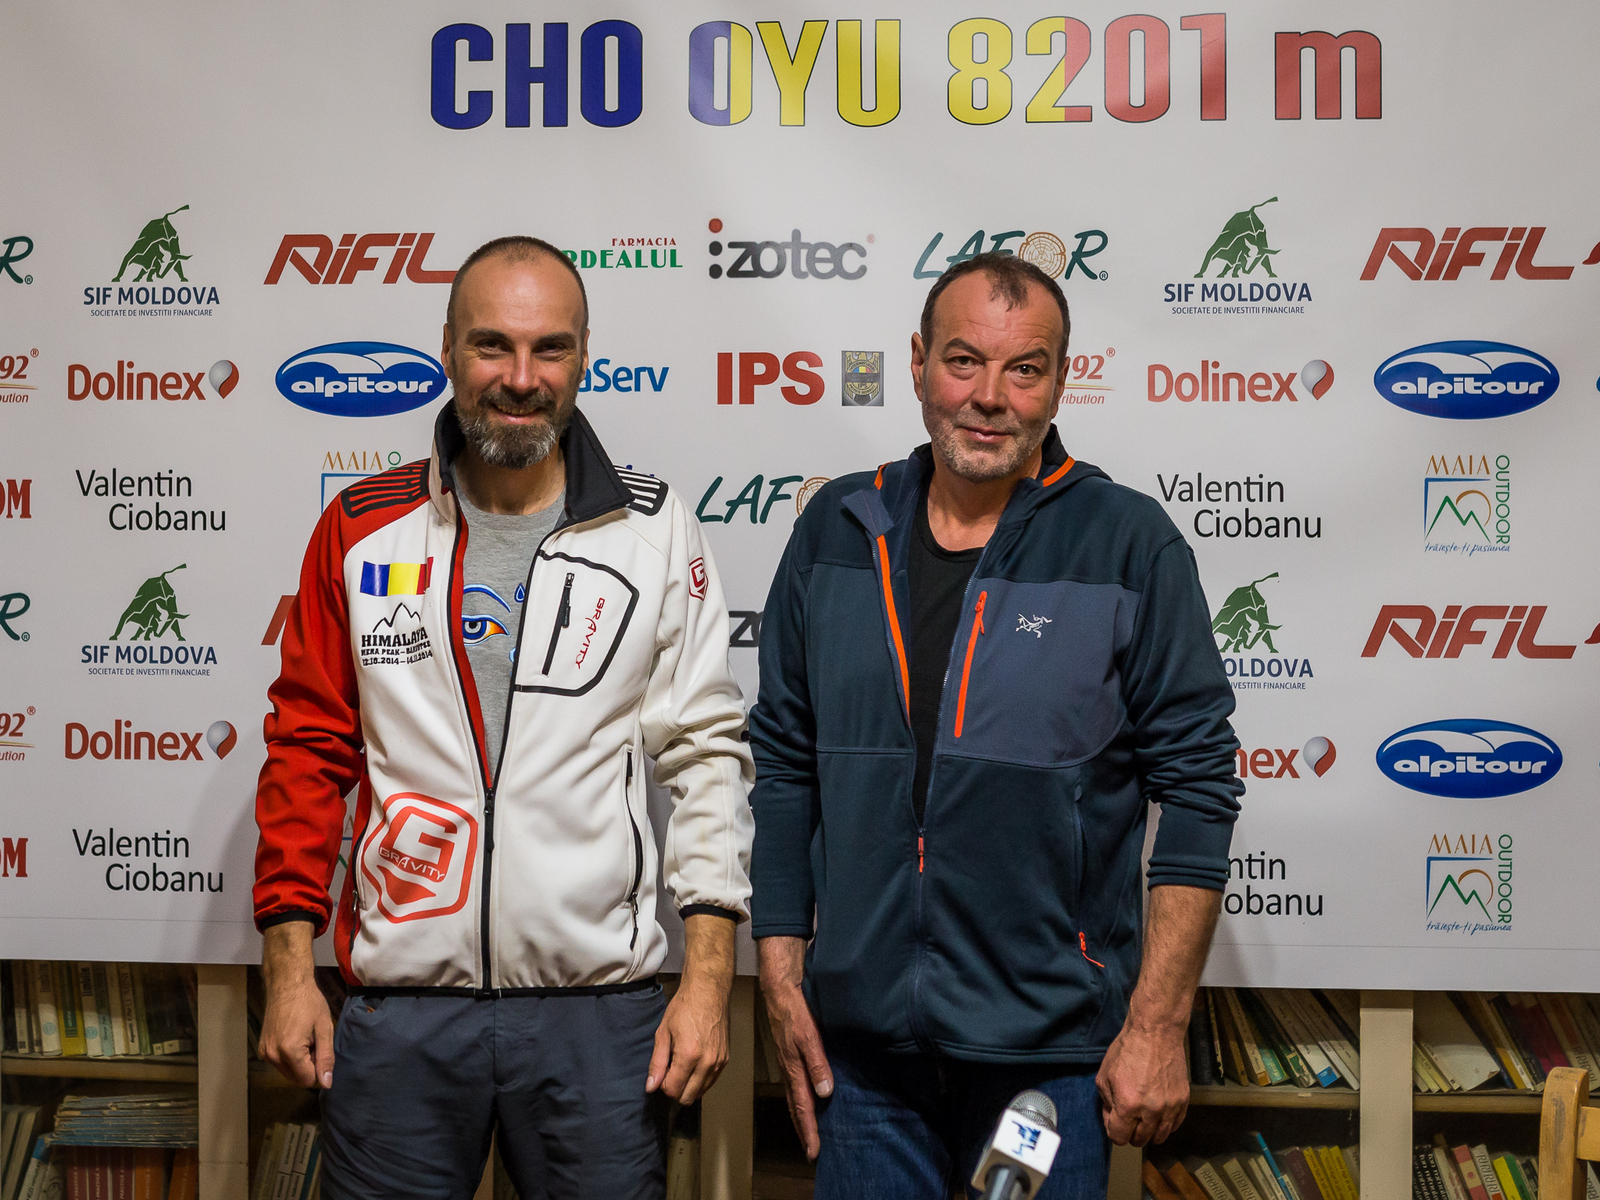 Expeditie Cho Oyu